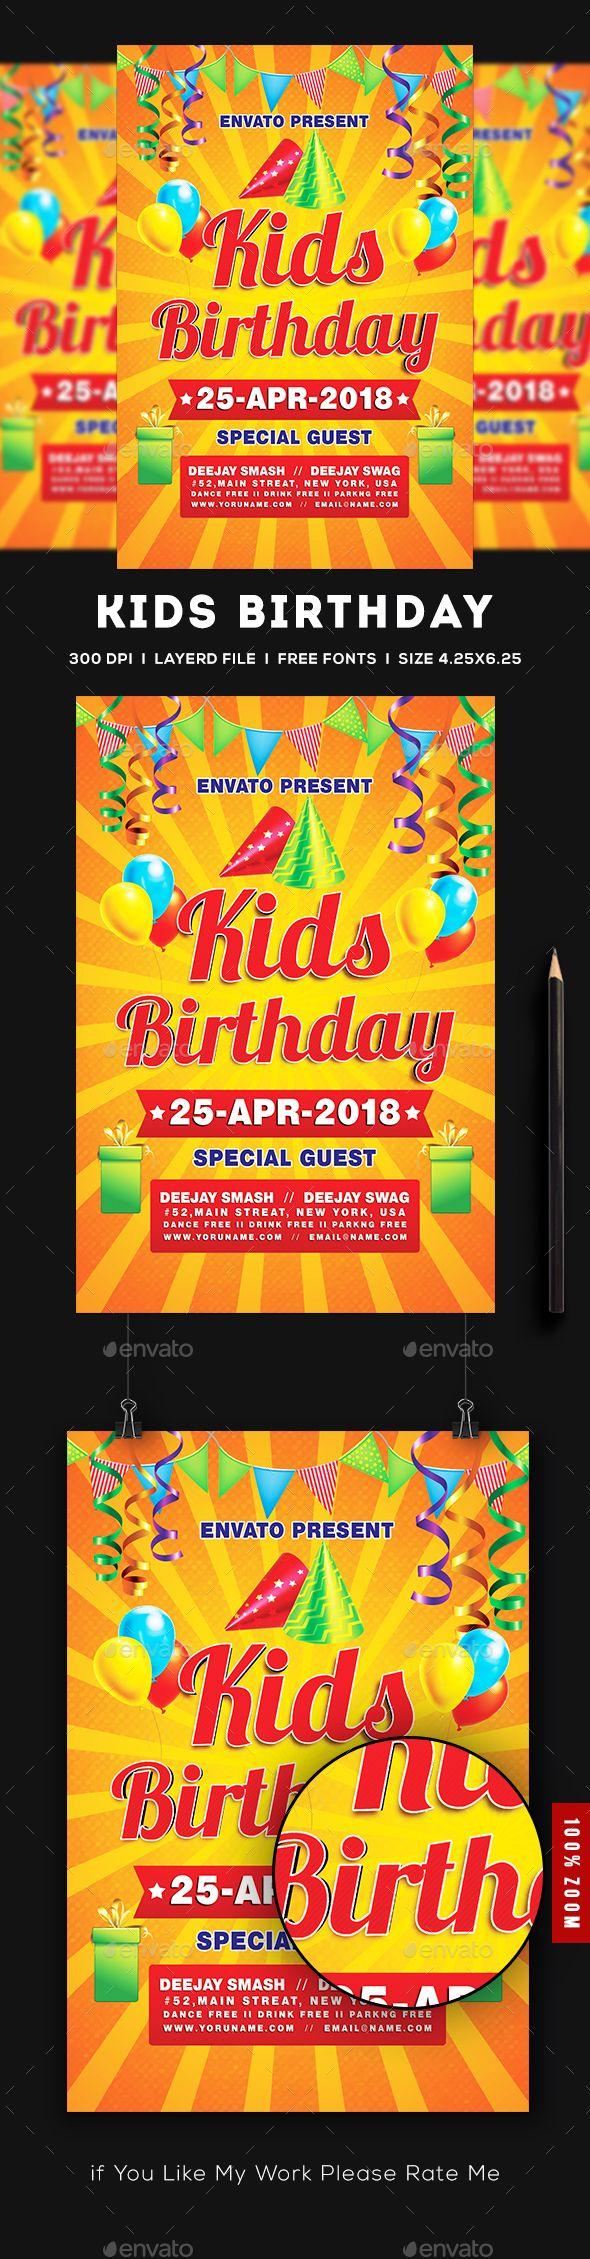 Kids birthday party invitation flyer template psd download https kids birthday party invitation flyer template psd download httpsgraphicriver filmwisefo